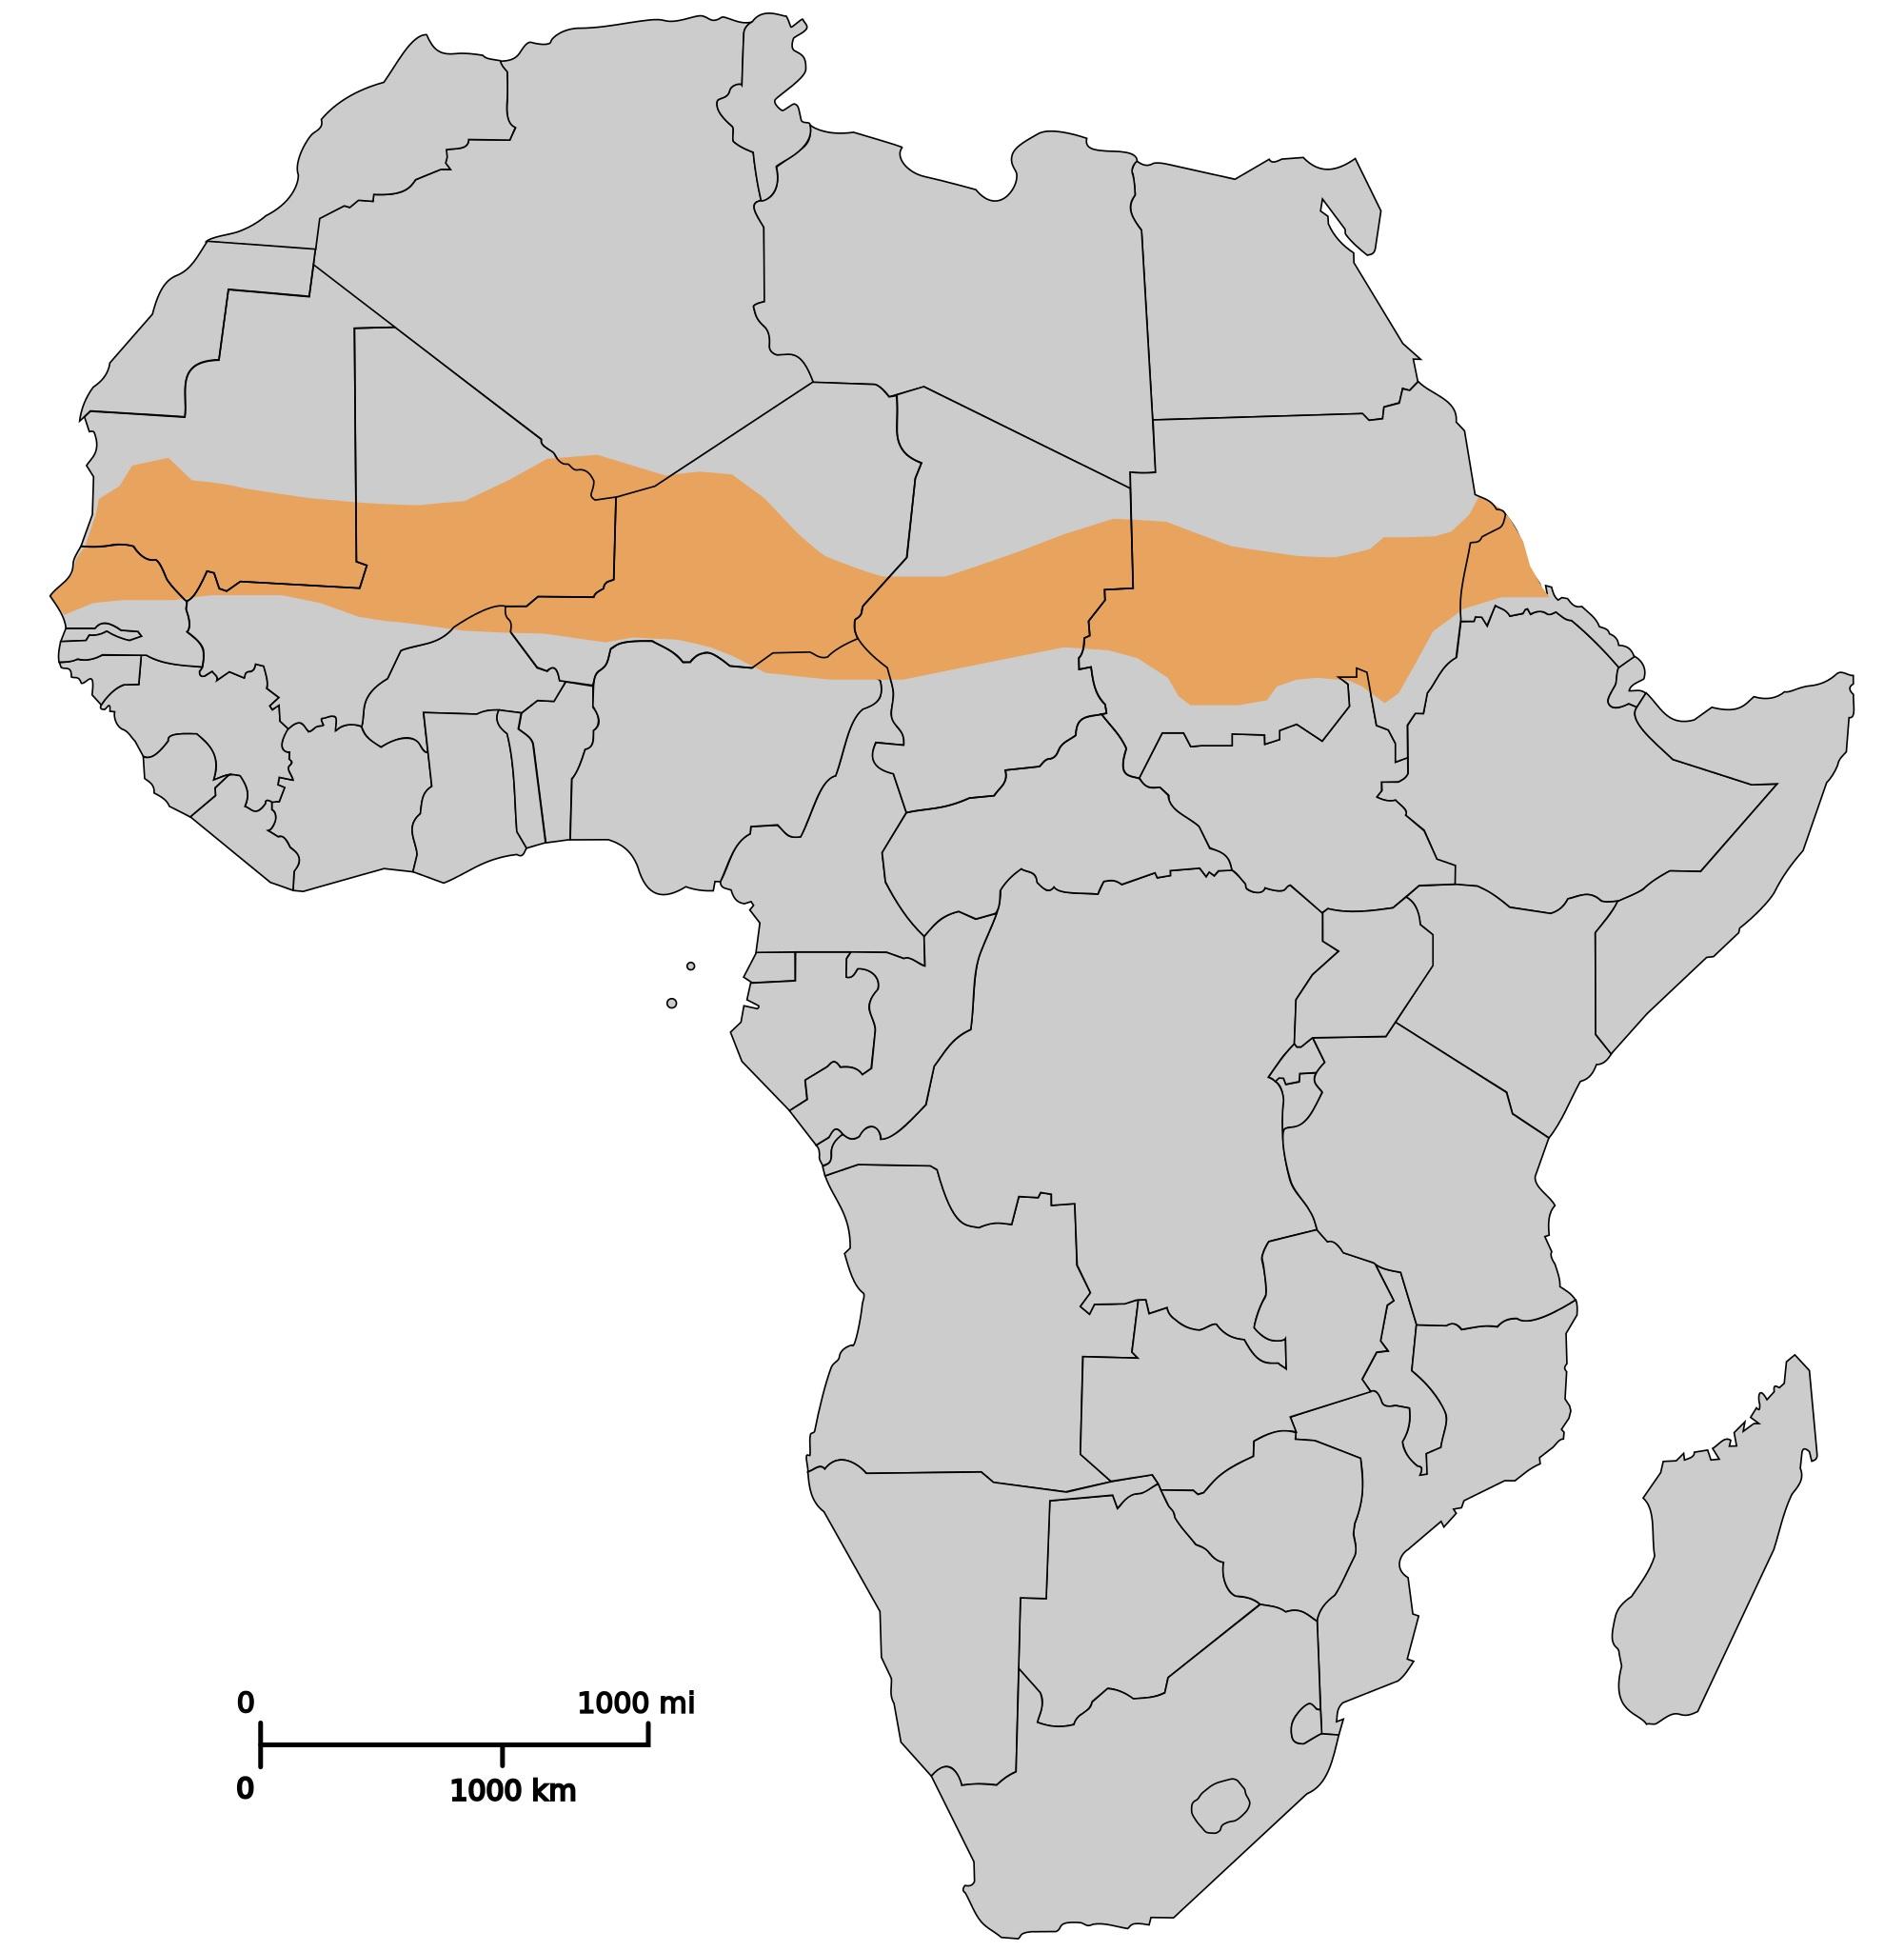 http://upload.wikimedia.org/wikipedia/commons/2/2b/Map_sahel.jpg?uselang=ru